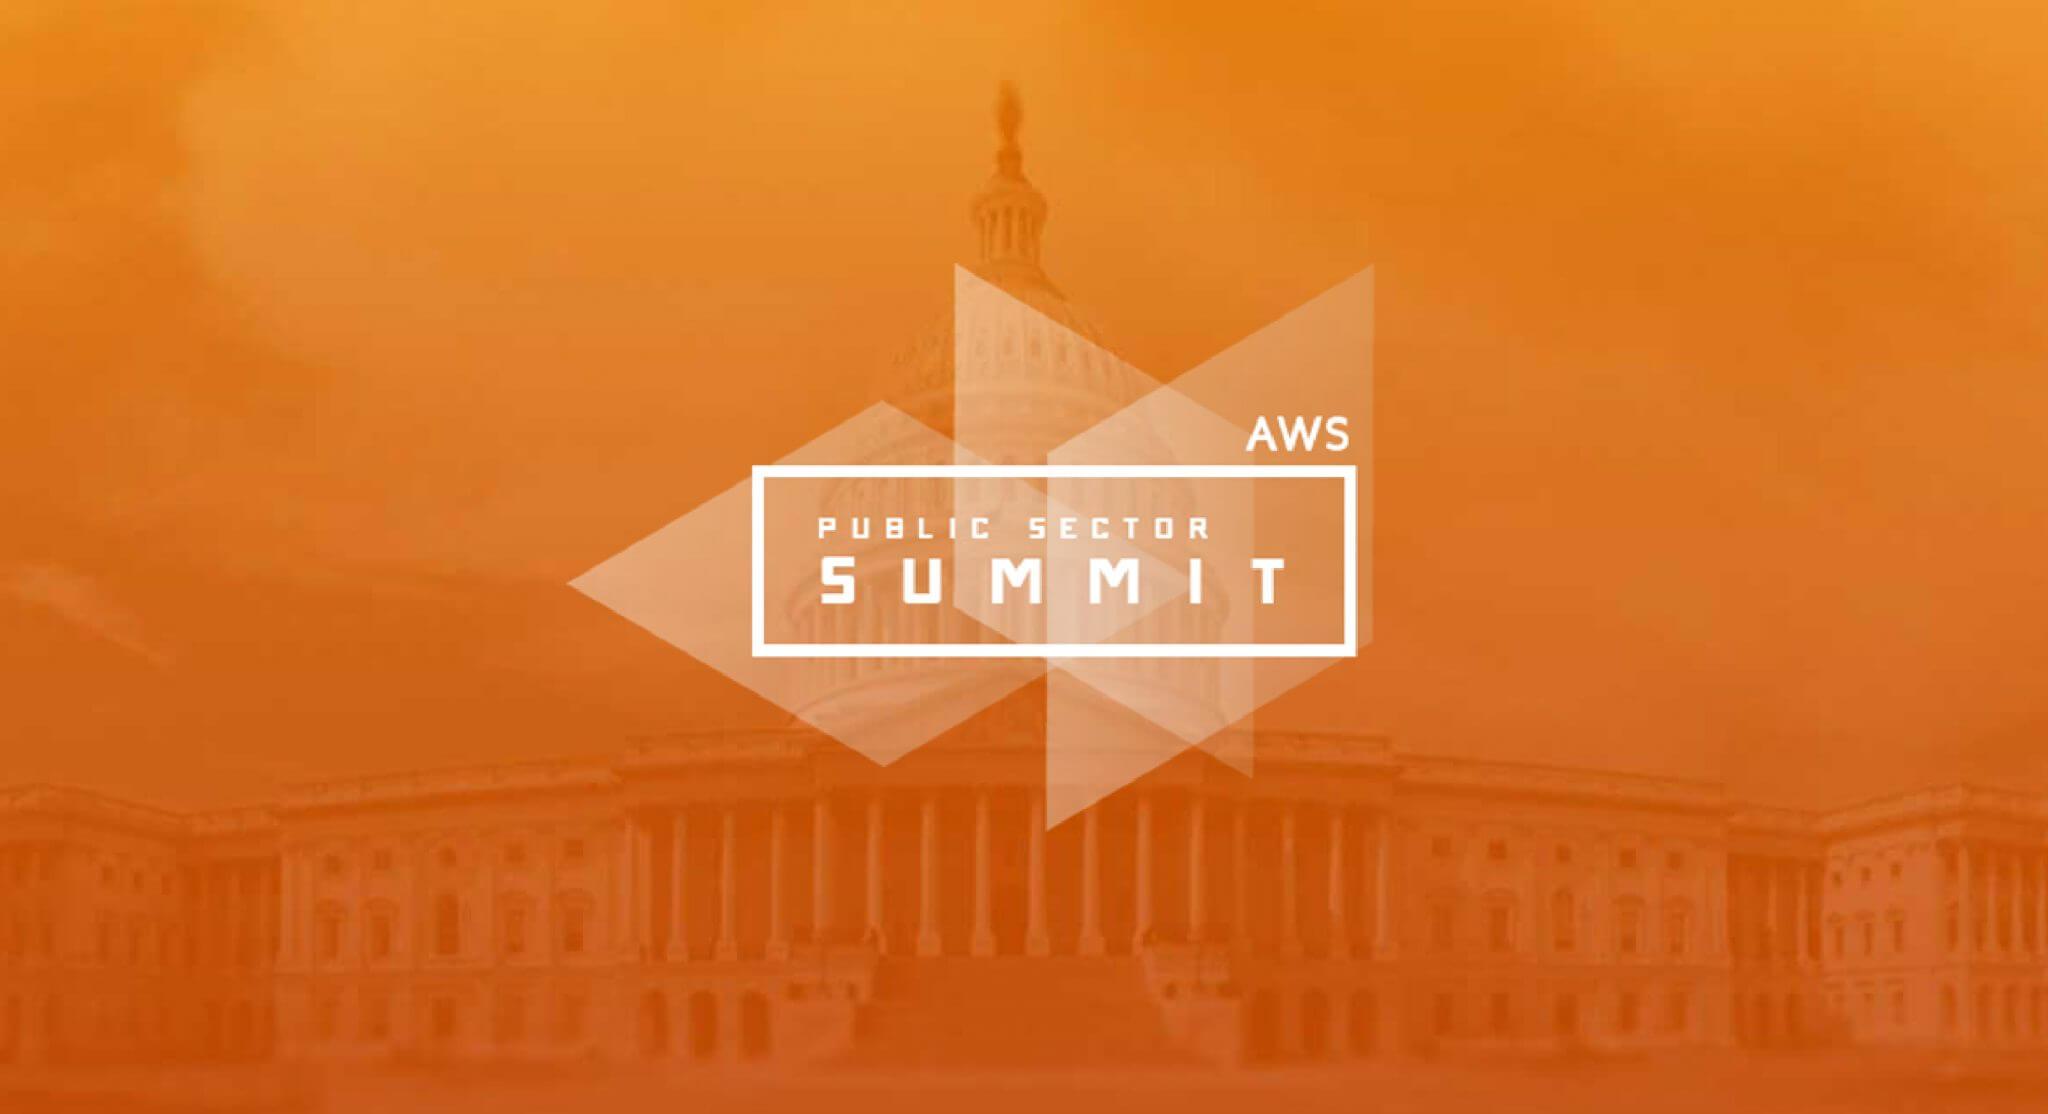 aws summit washington logo banner-01